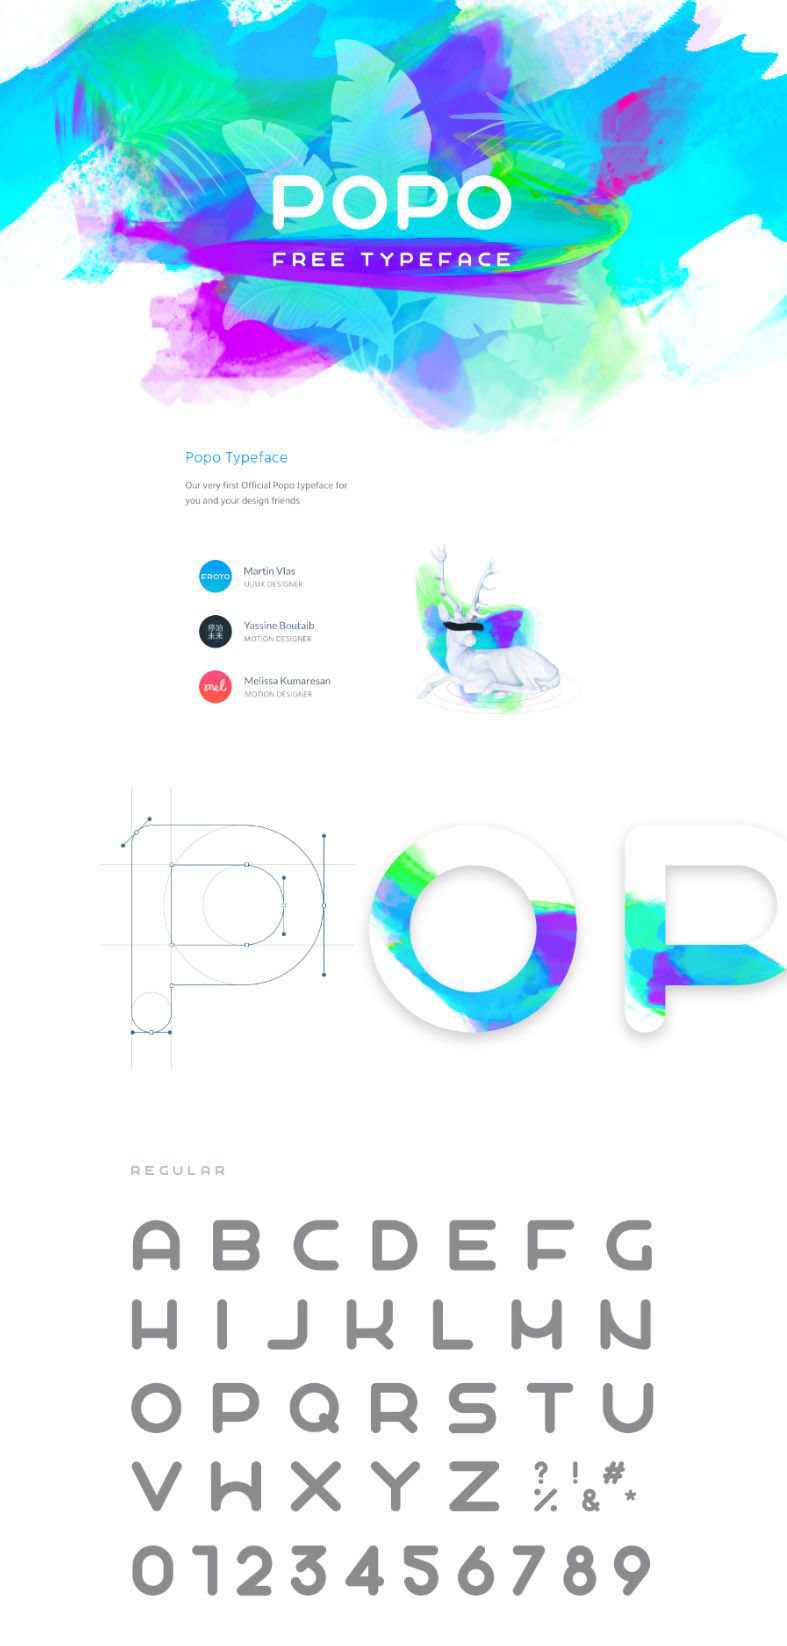 POPO Free Font - Free Design Resources